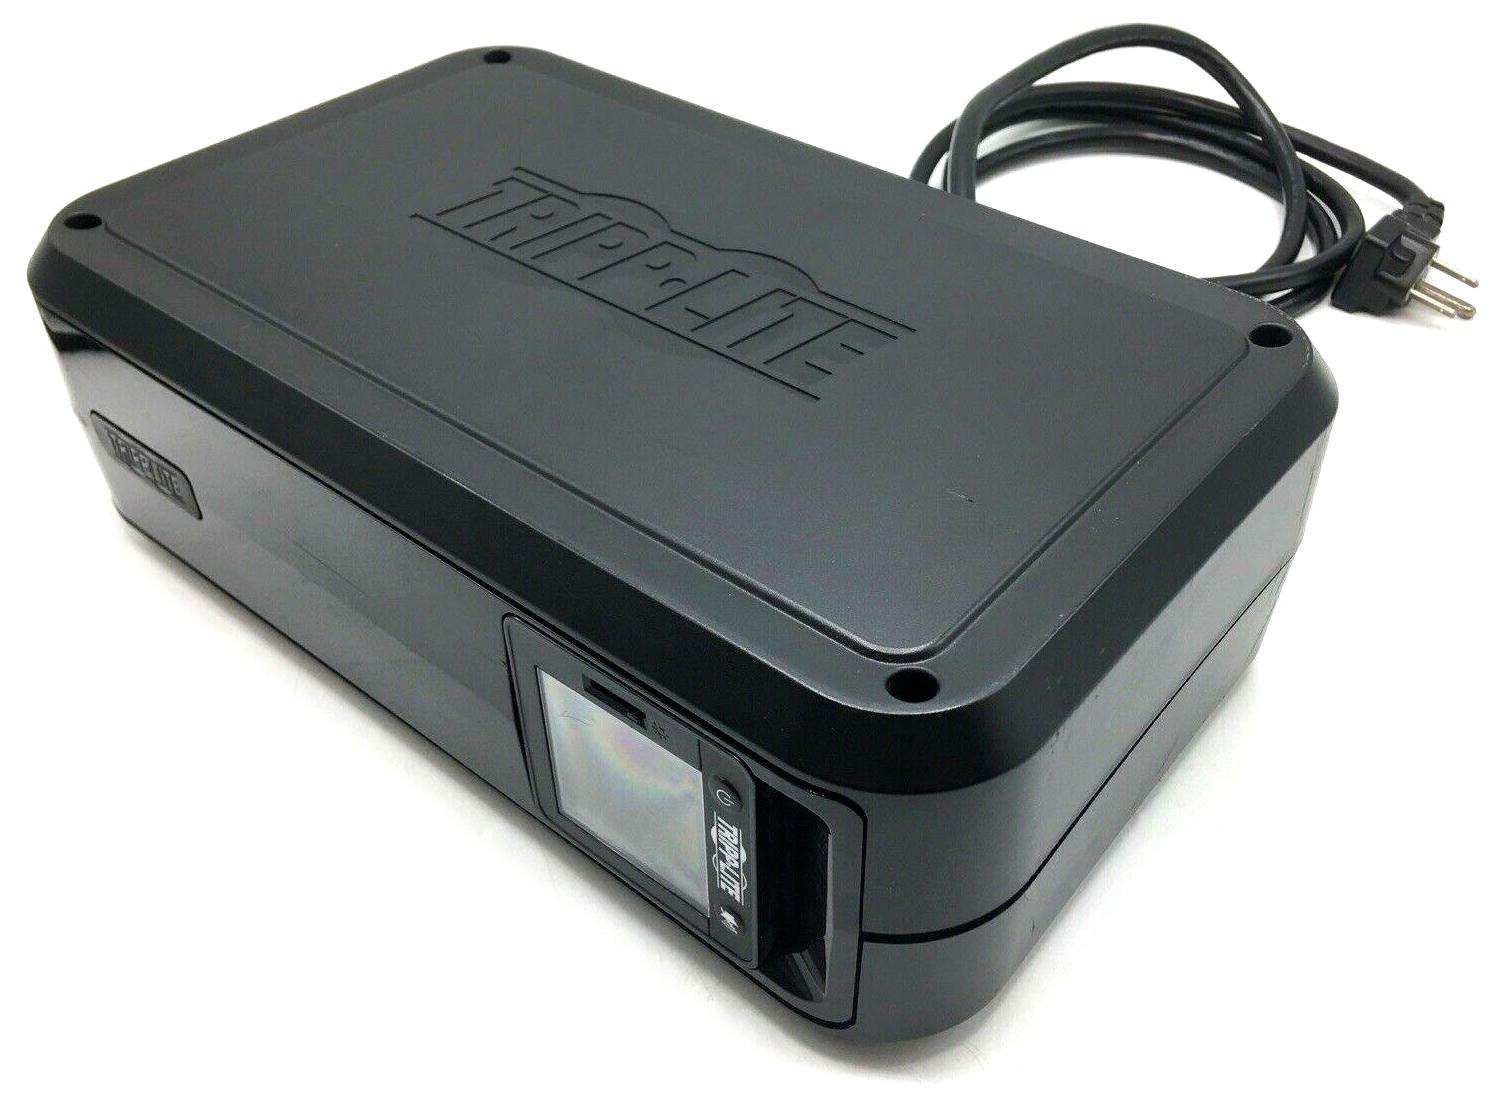 USB 8 Outlet OMNI900LCD 900VA Digital AVR UPS LCD 120V Sold as 1 Each